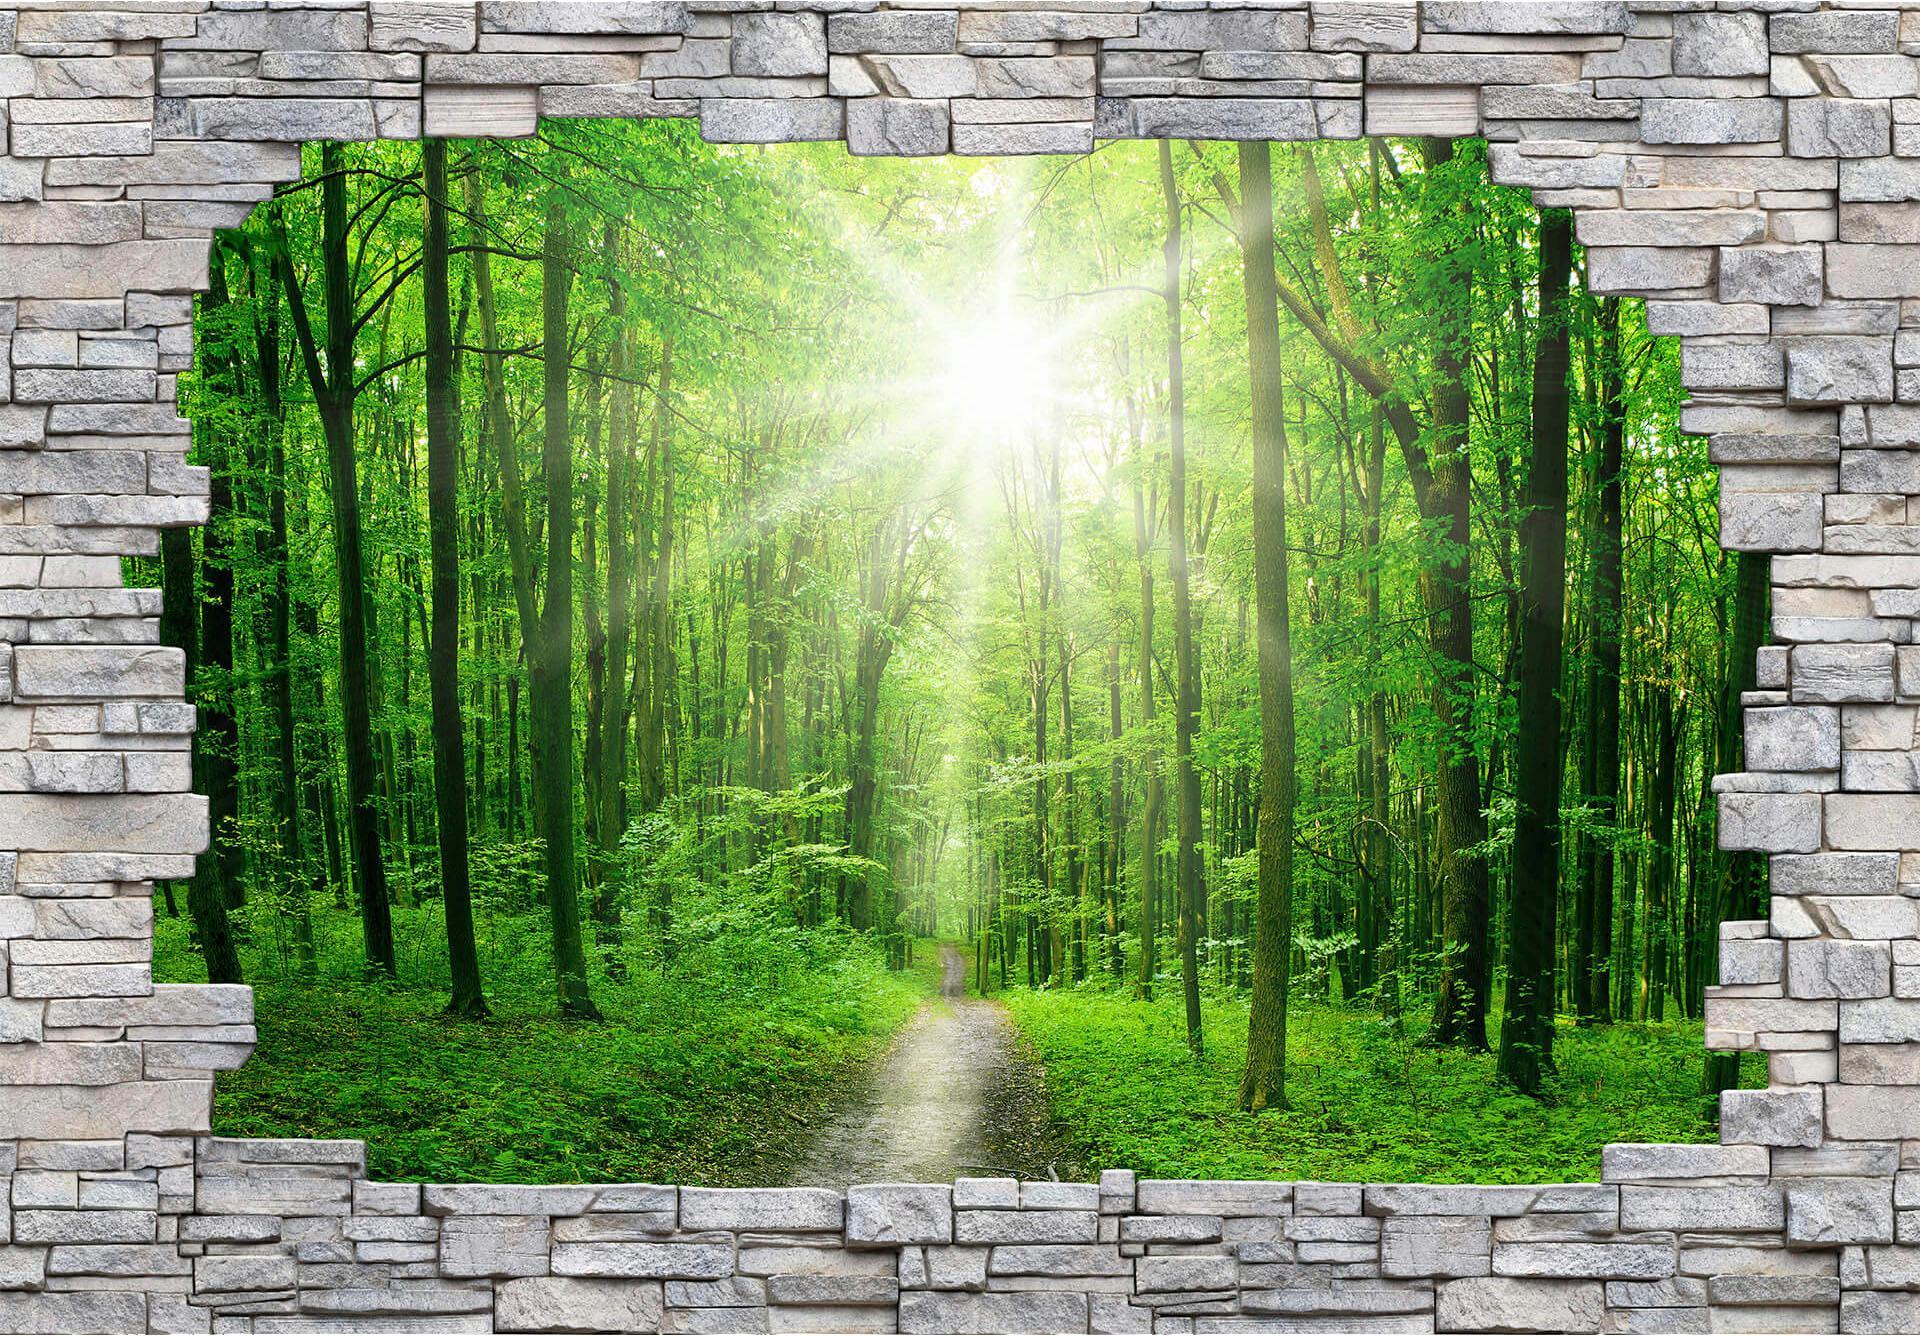 Fototapete 3D Sunny Forest Mauer Wohnen/Wohntextilien/Tapeten/Fototapeten/Fototapeten Natur